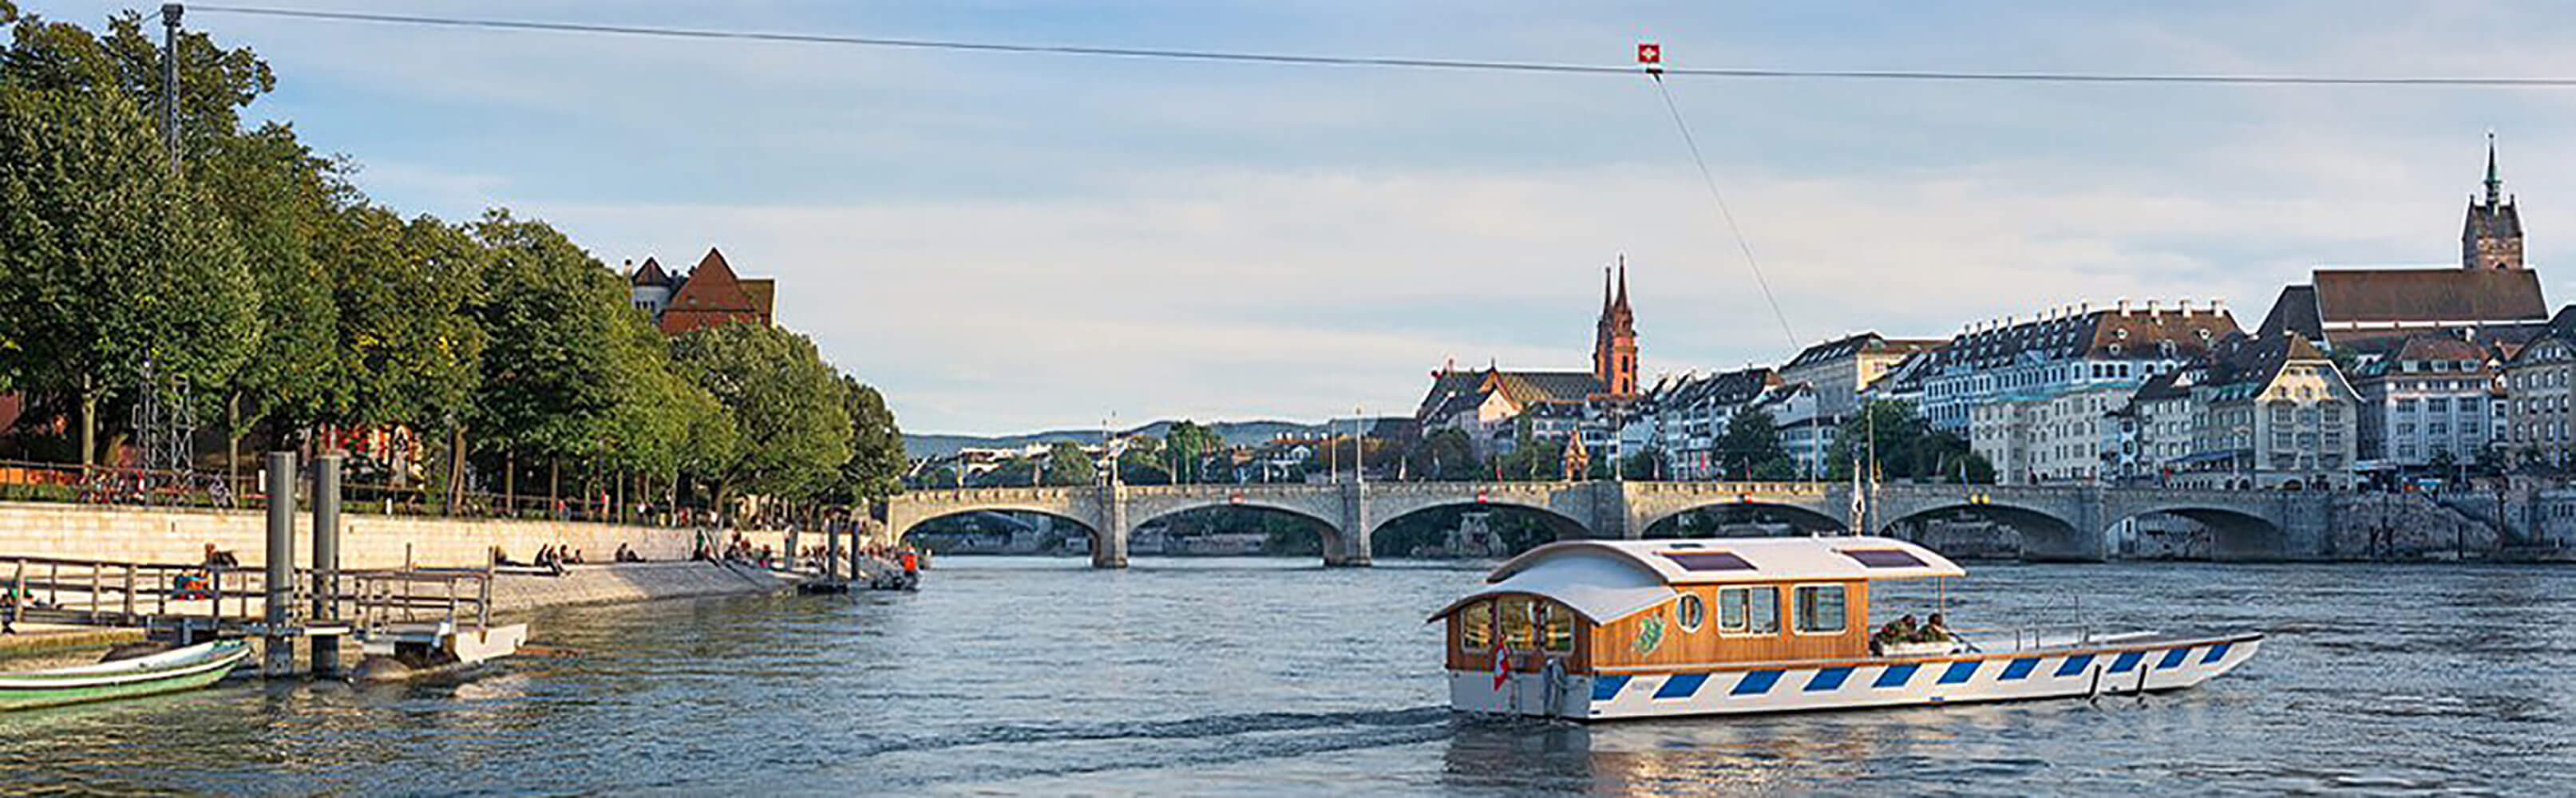 Basel - Die Kulturhauptstadt der Schweiz 1